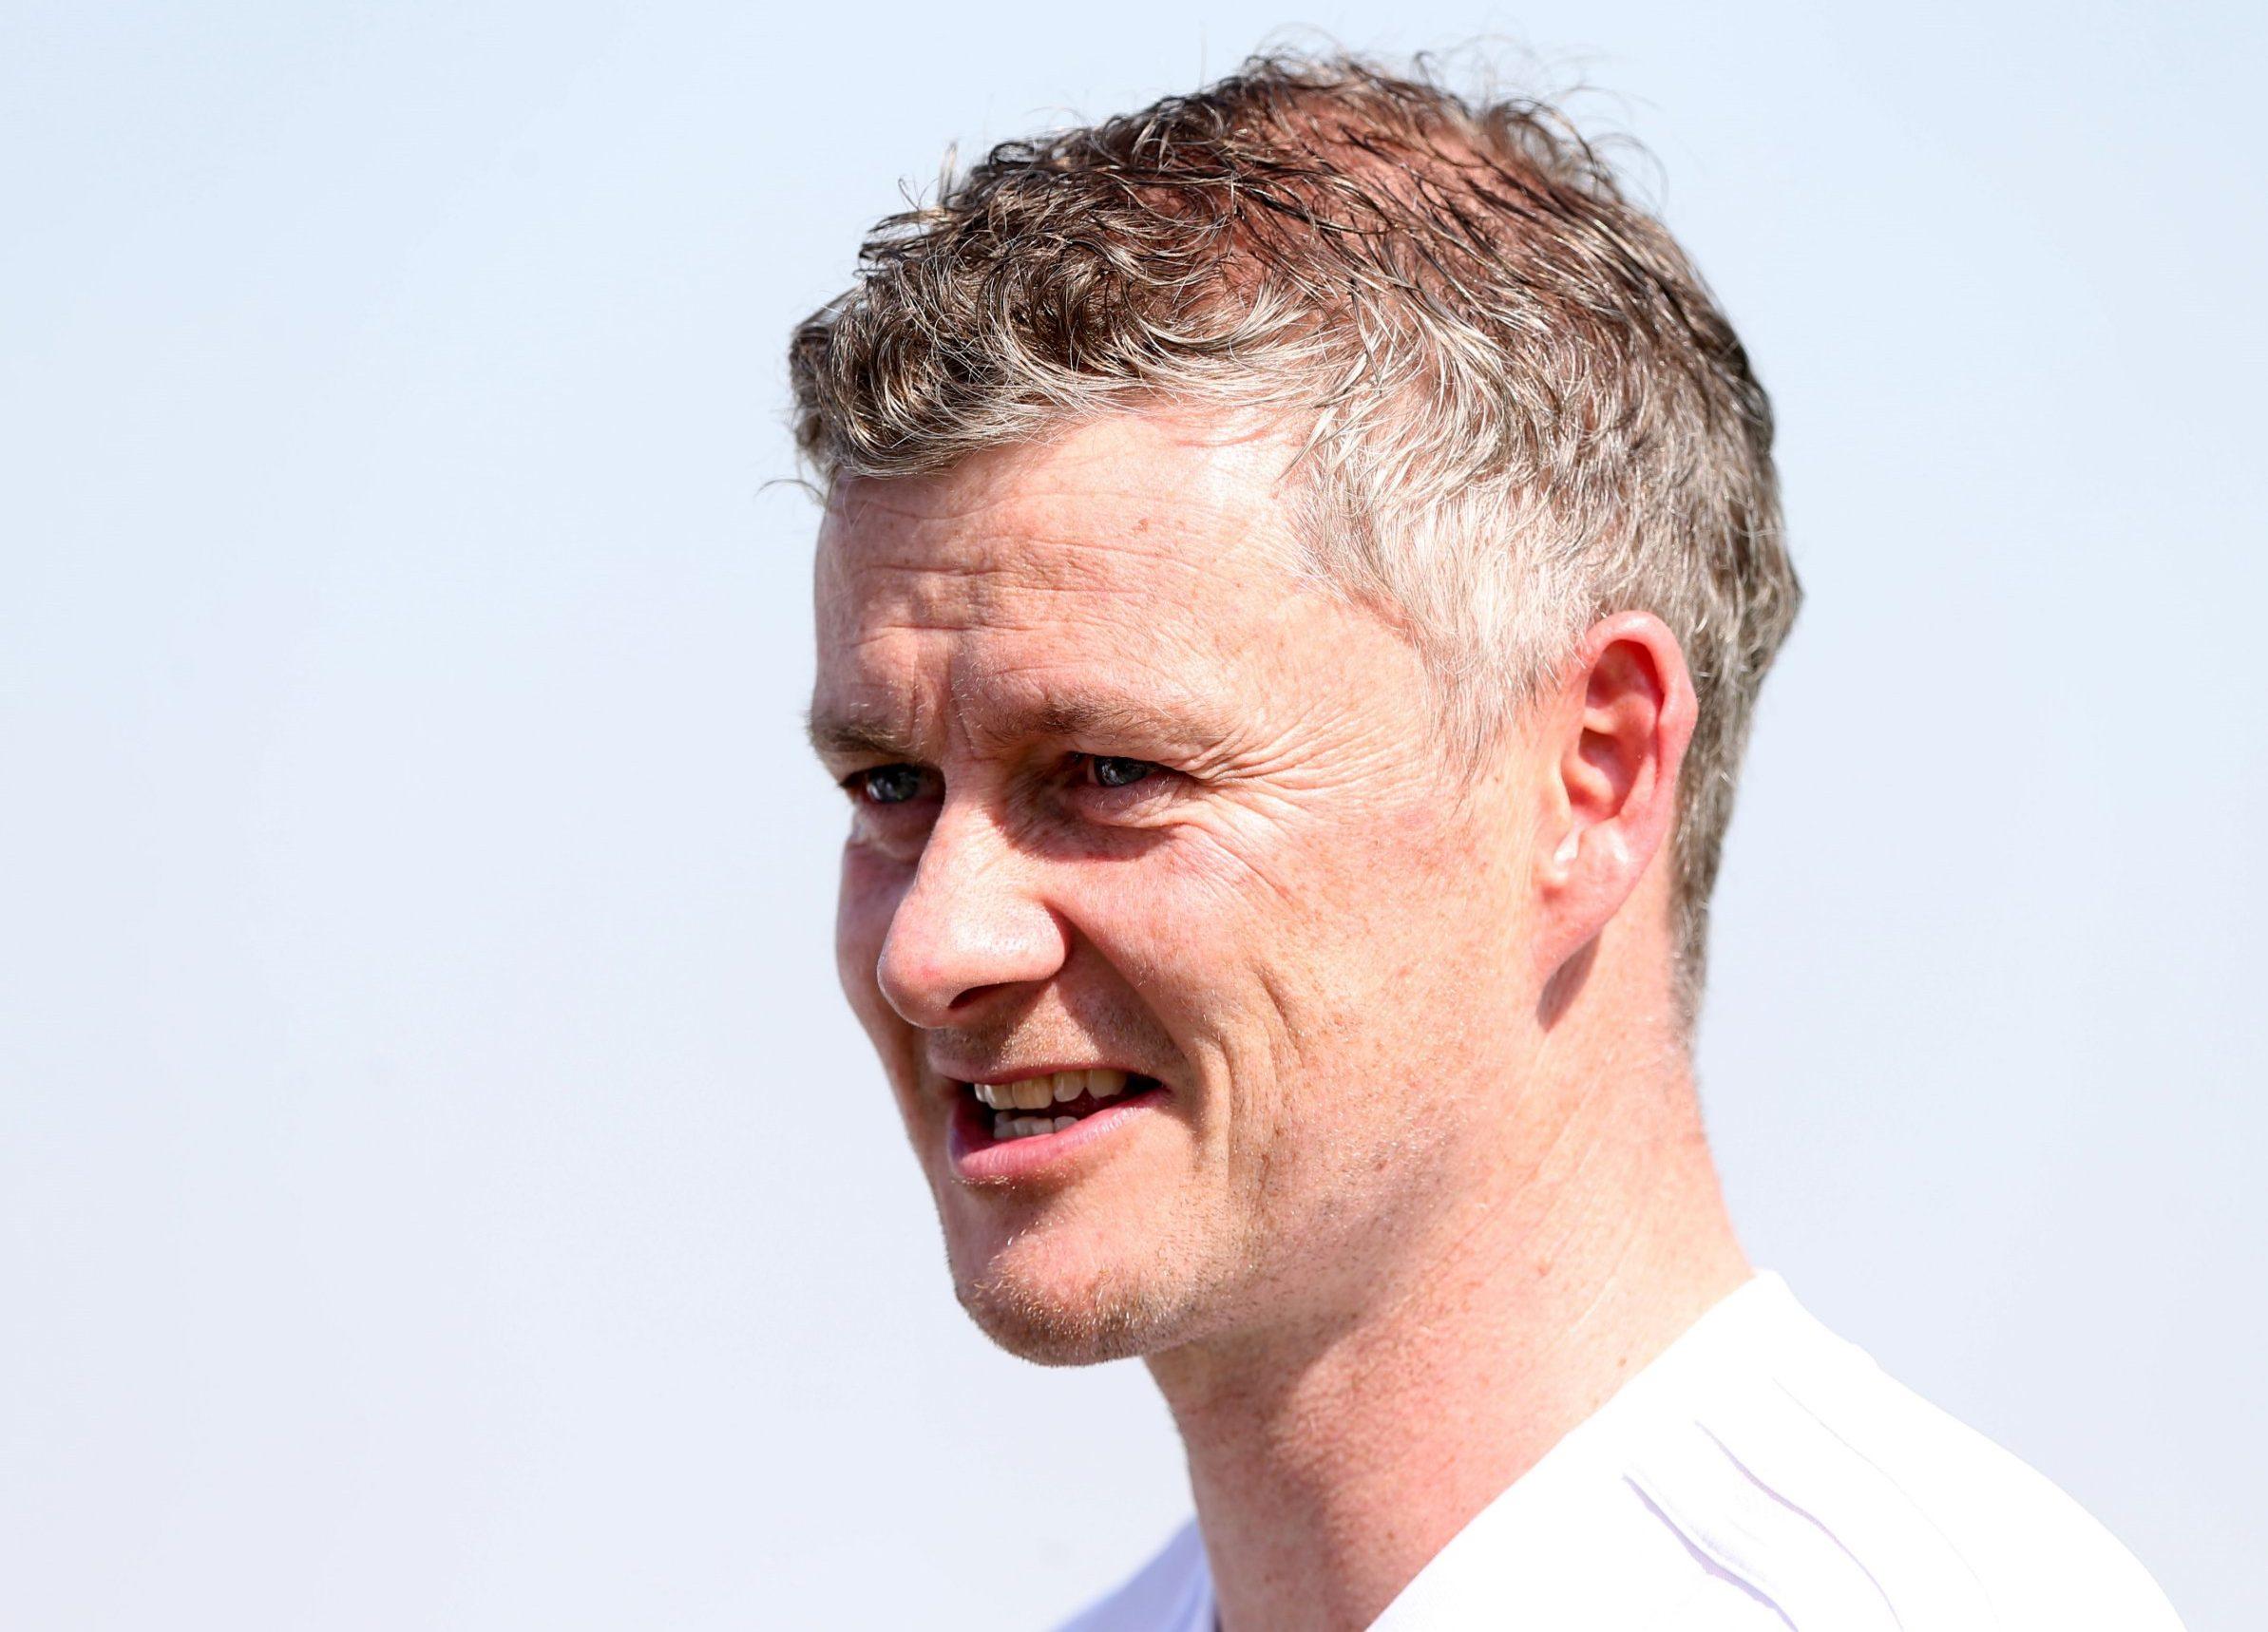 Ole Gunnar Solskjaer tells Marcus Rashford he is first-choice Manchester United striker ahead of Romelu Lukaku